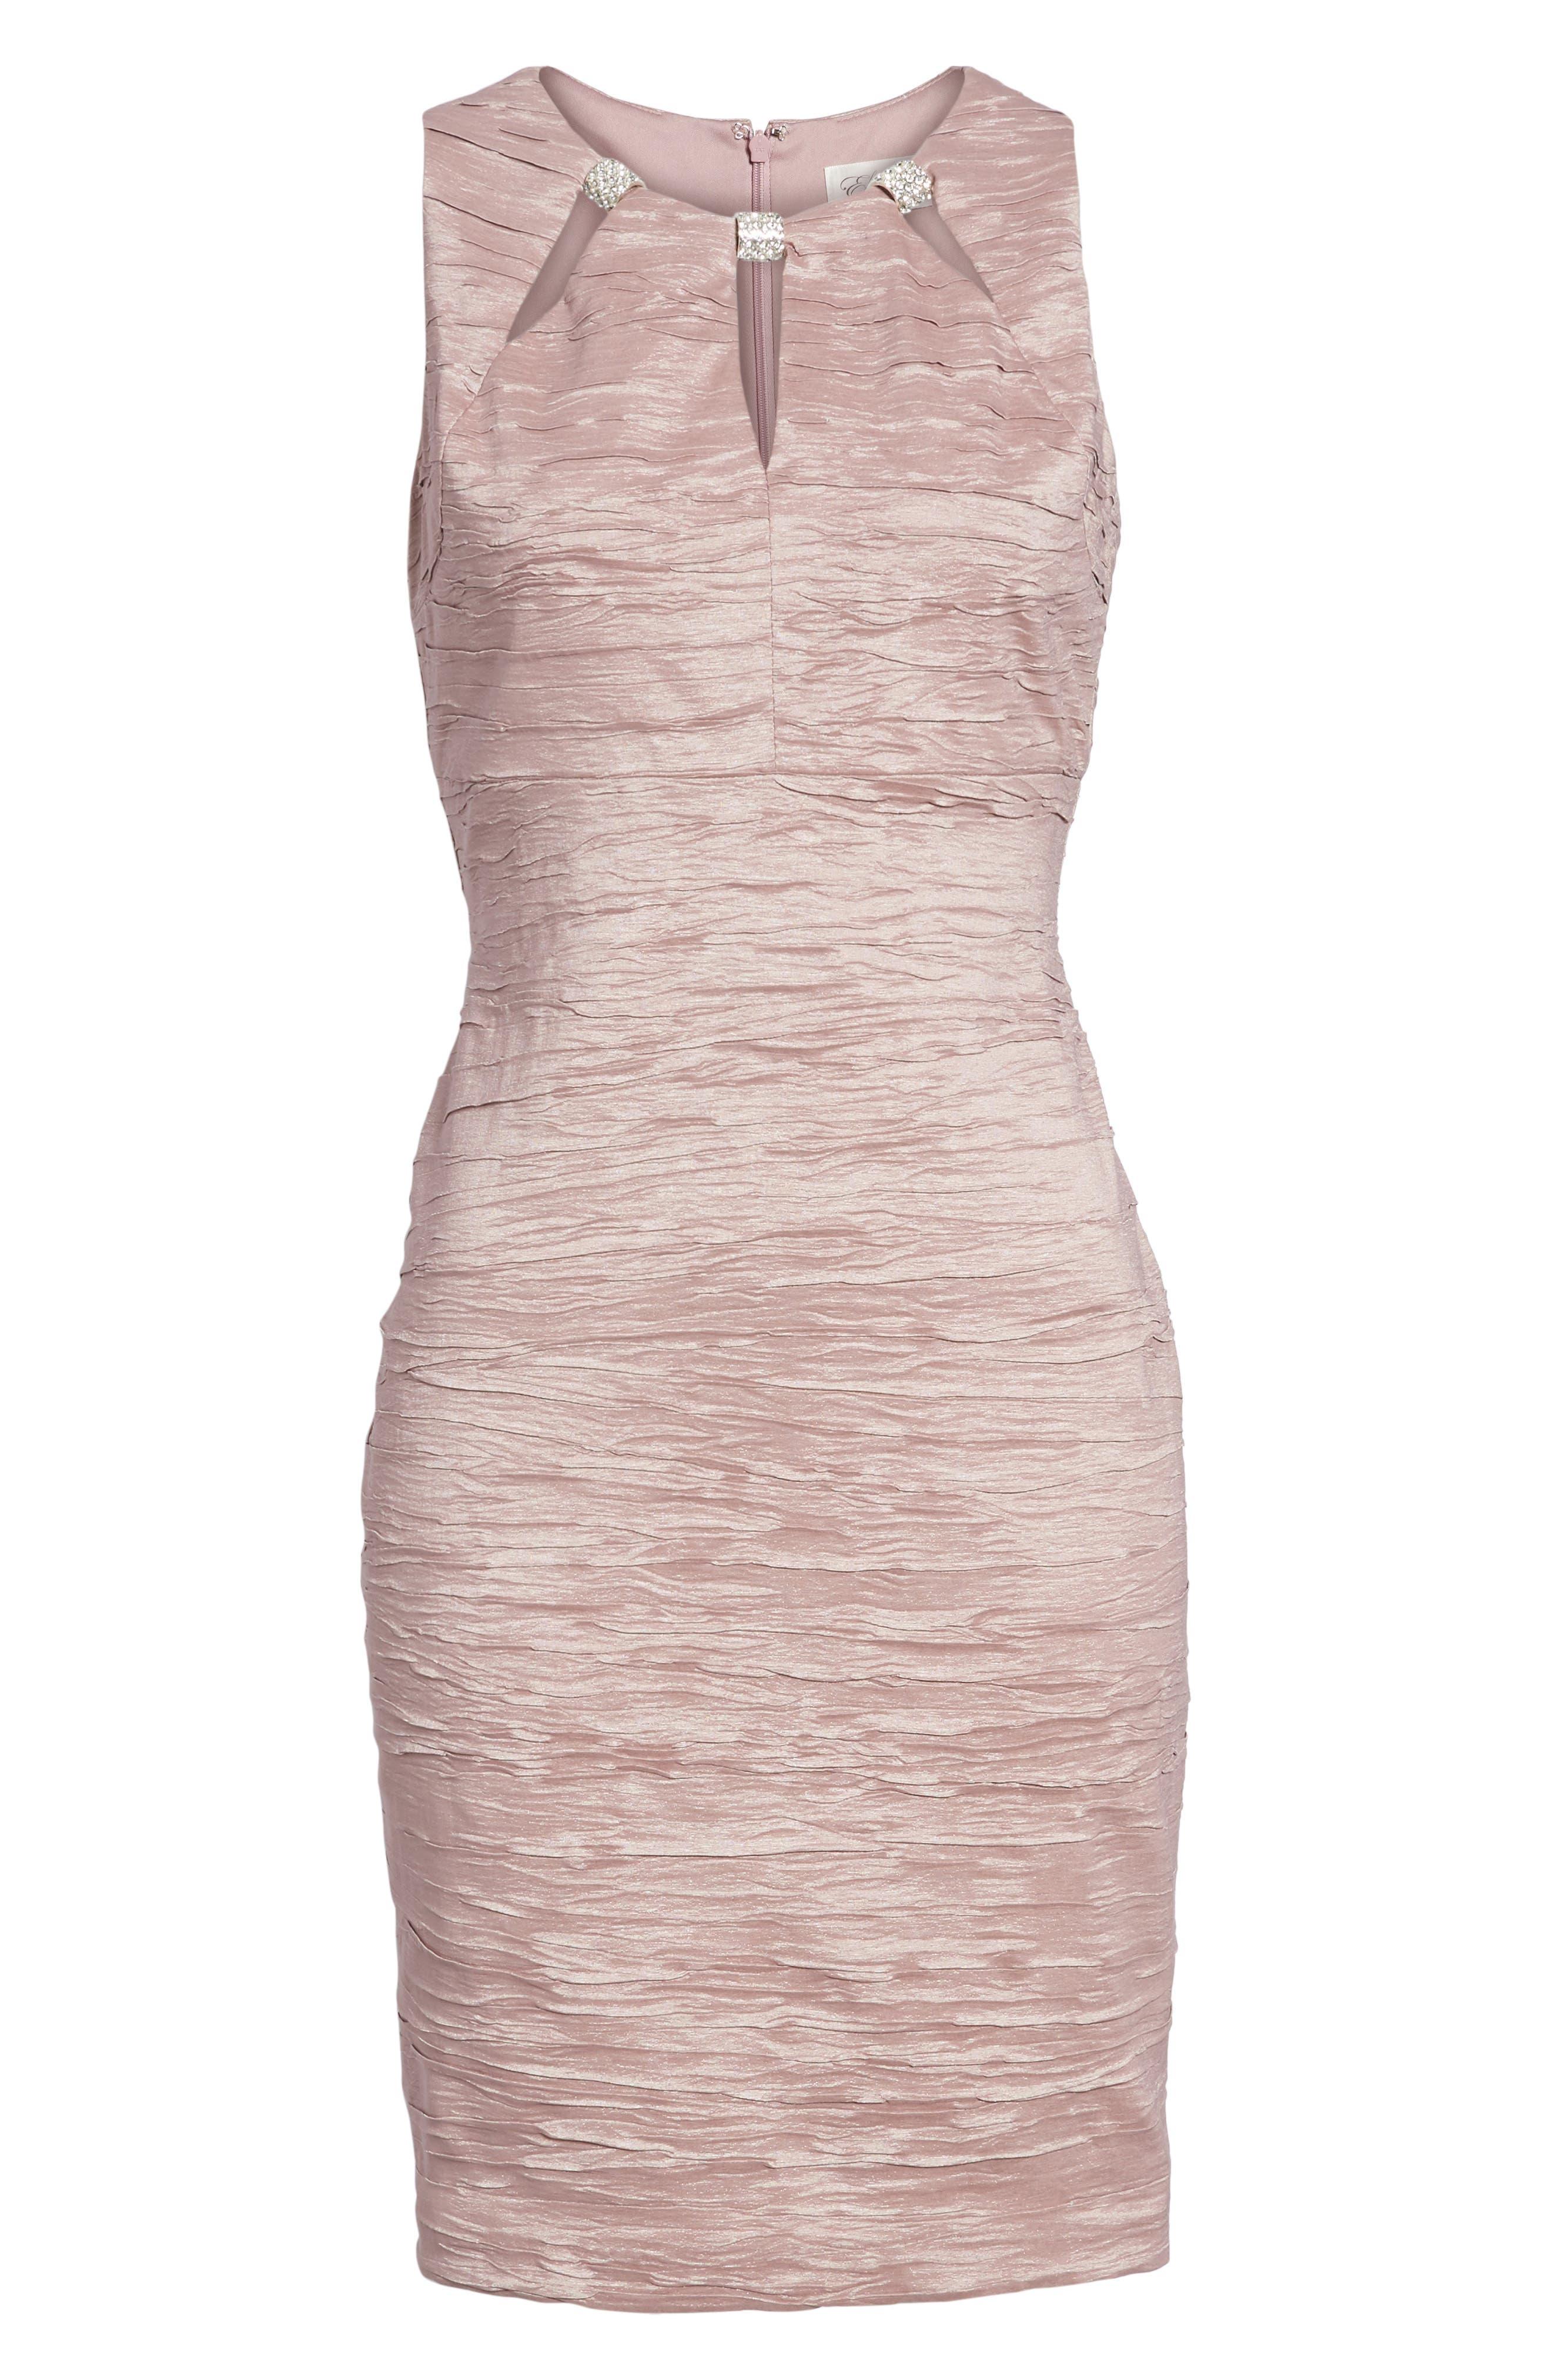 Embellished Cutout Taffeta Sheath Dress,                             Alternate thumbnail 7, color,                             Mauve